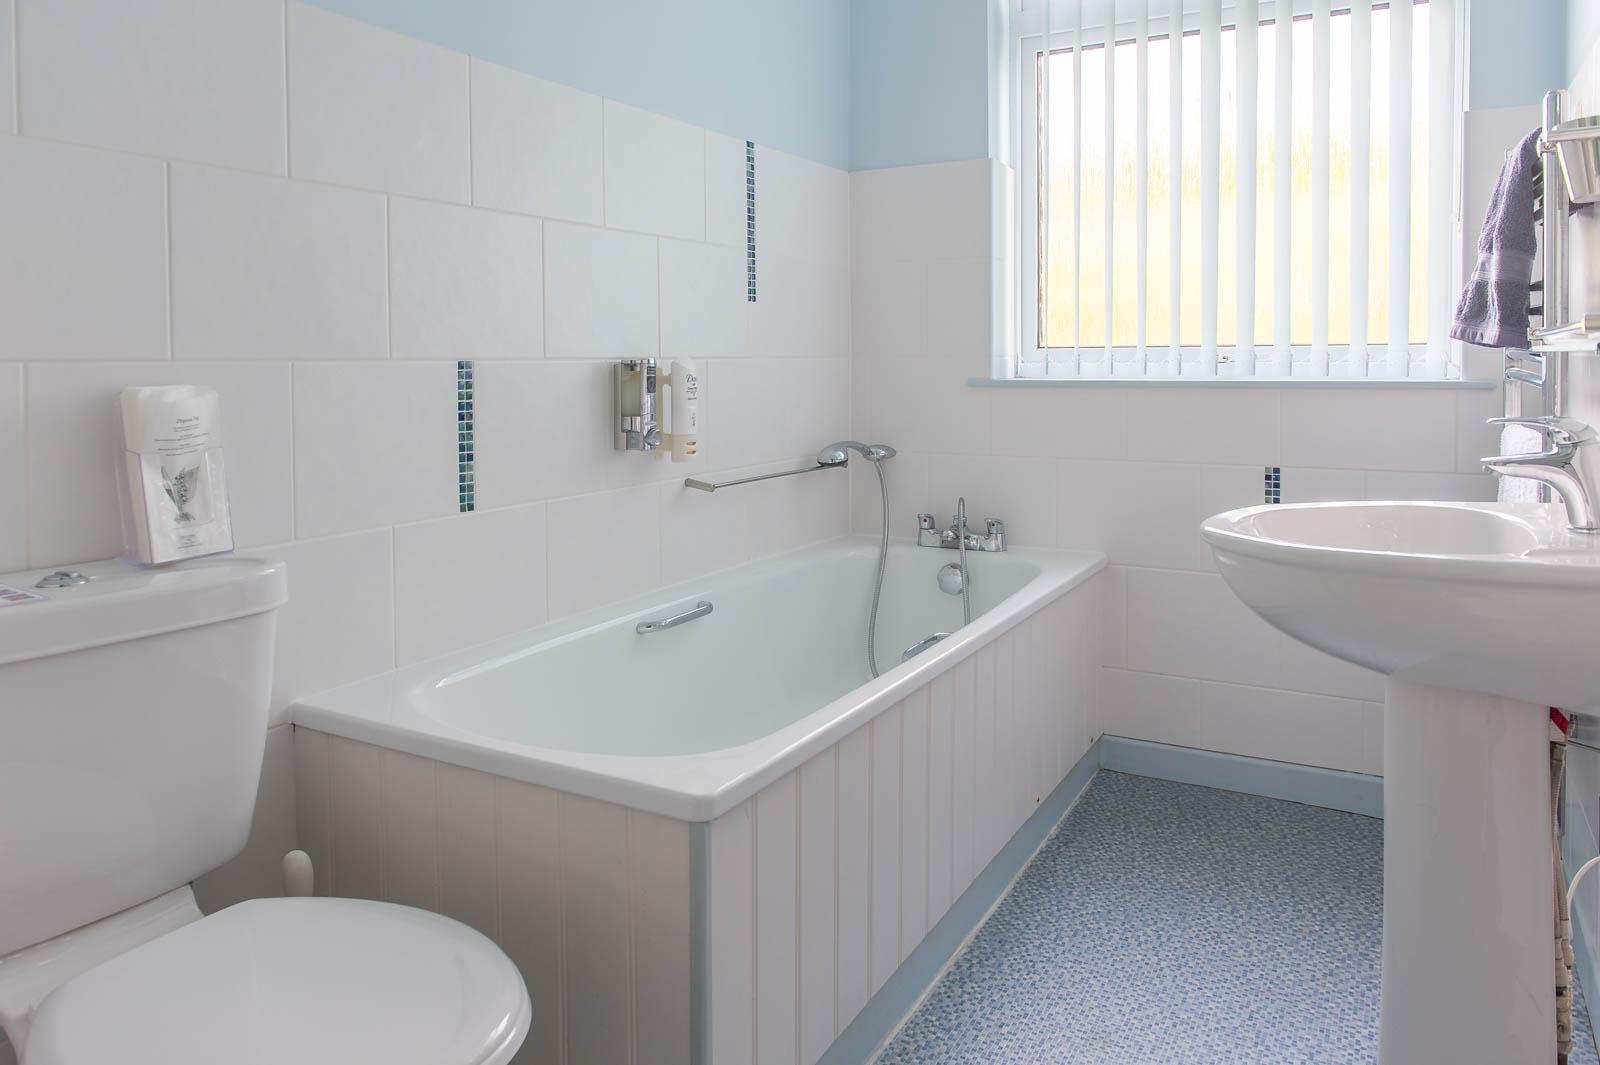 The Bluff Kestrels Bathroom